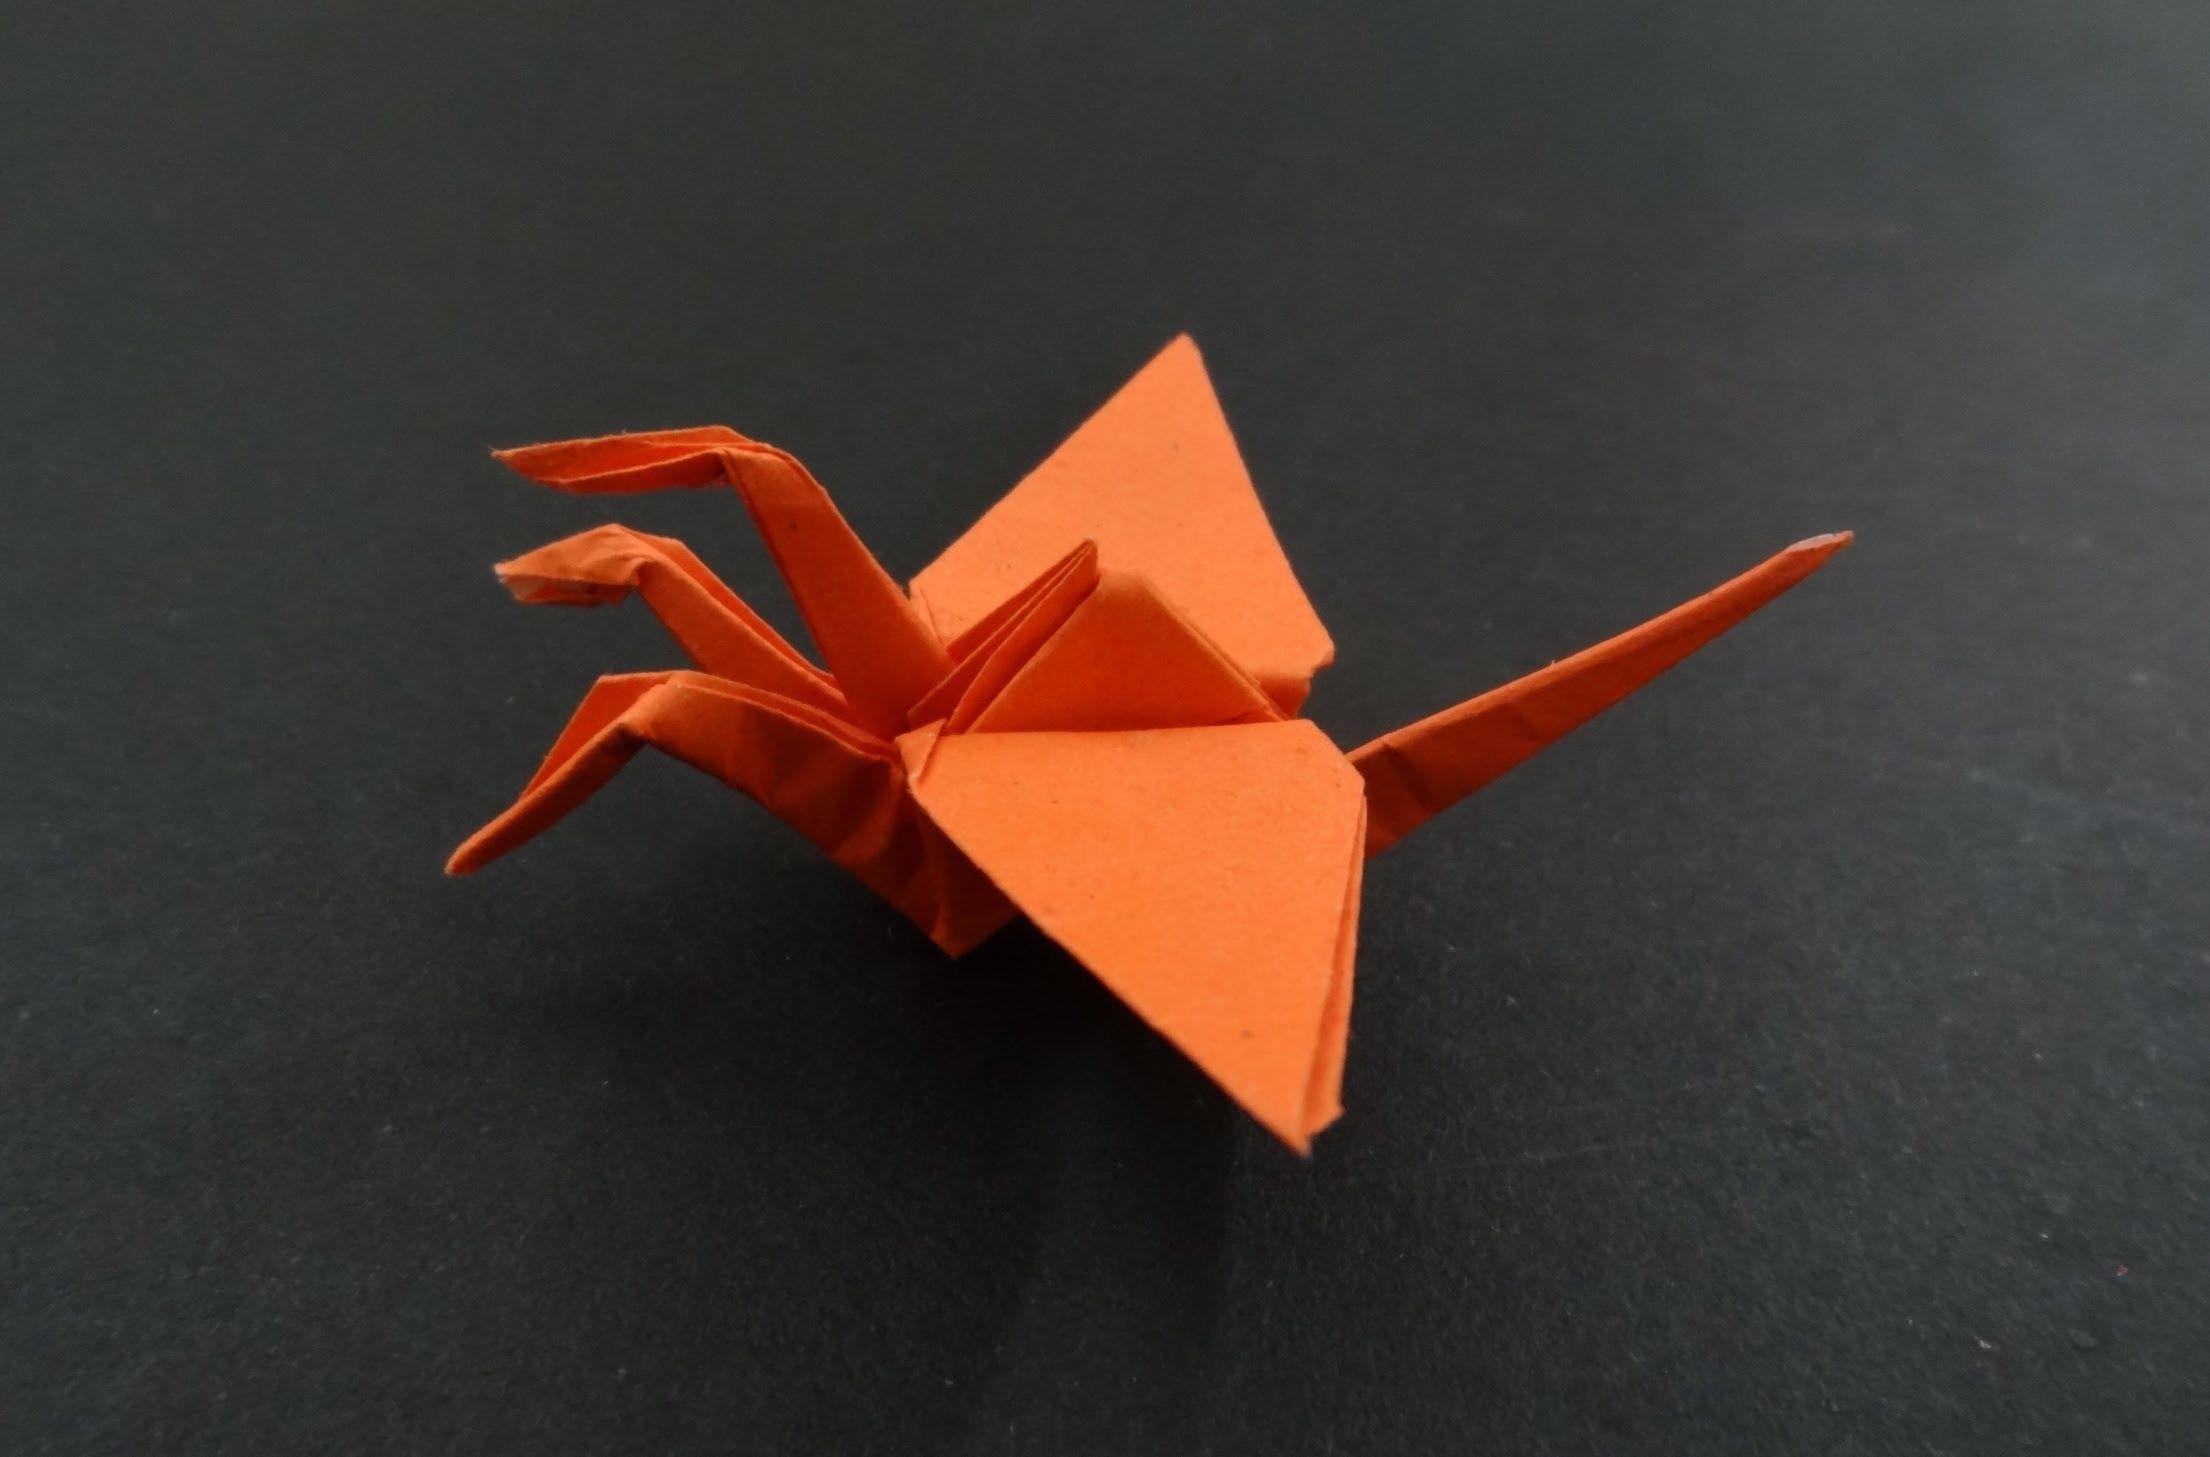 Origami crane tutorial how to fold 3 headed origami crane origami crane tutorial how to fold 3 headed origami crane jeuxipadfo Choice Image